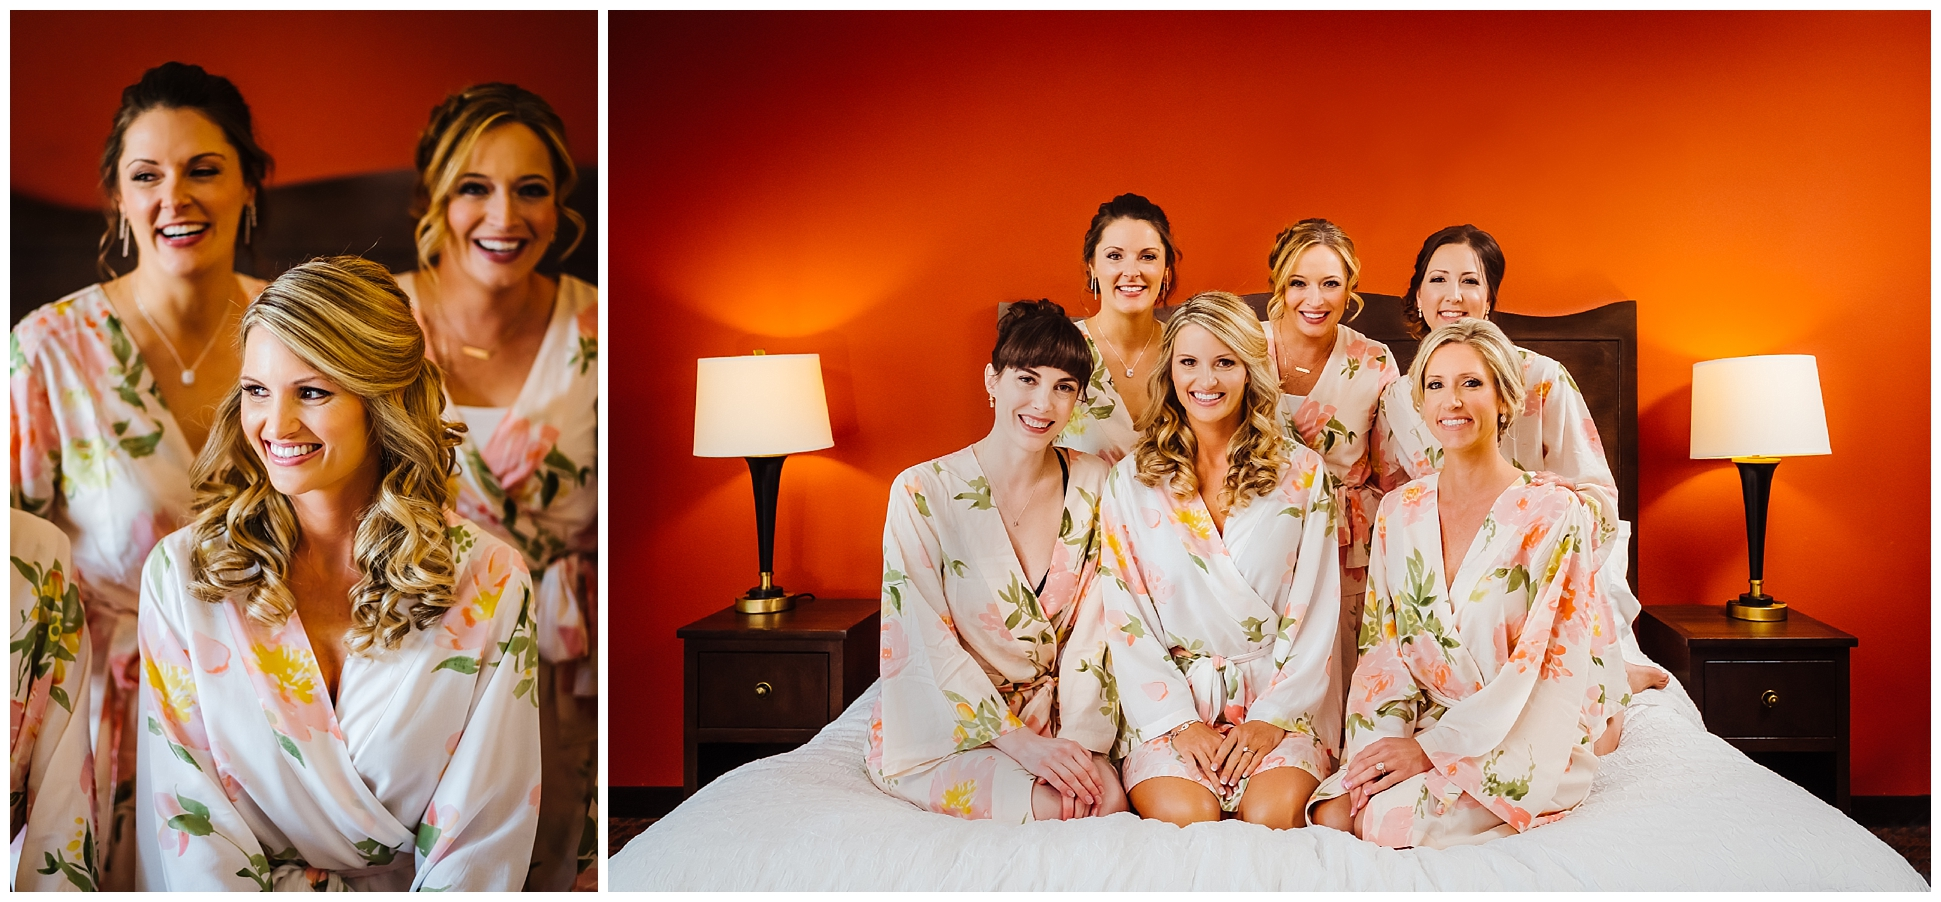 tampa-bradenton-wedding-photographer-south-florida-museum-classic-blush-gold-alpacas-sparklers_0006.jpg